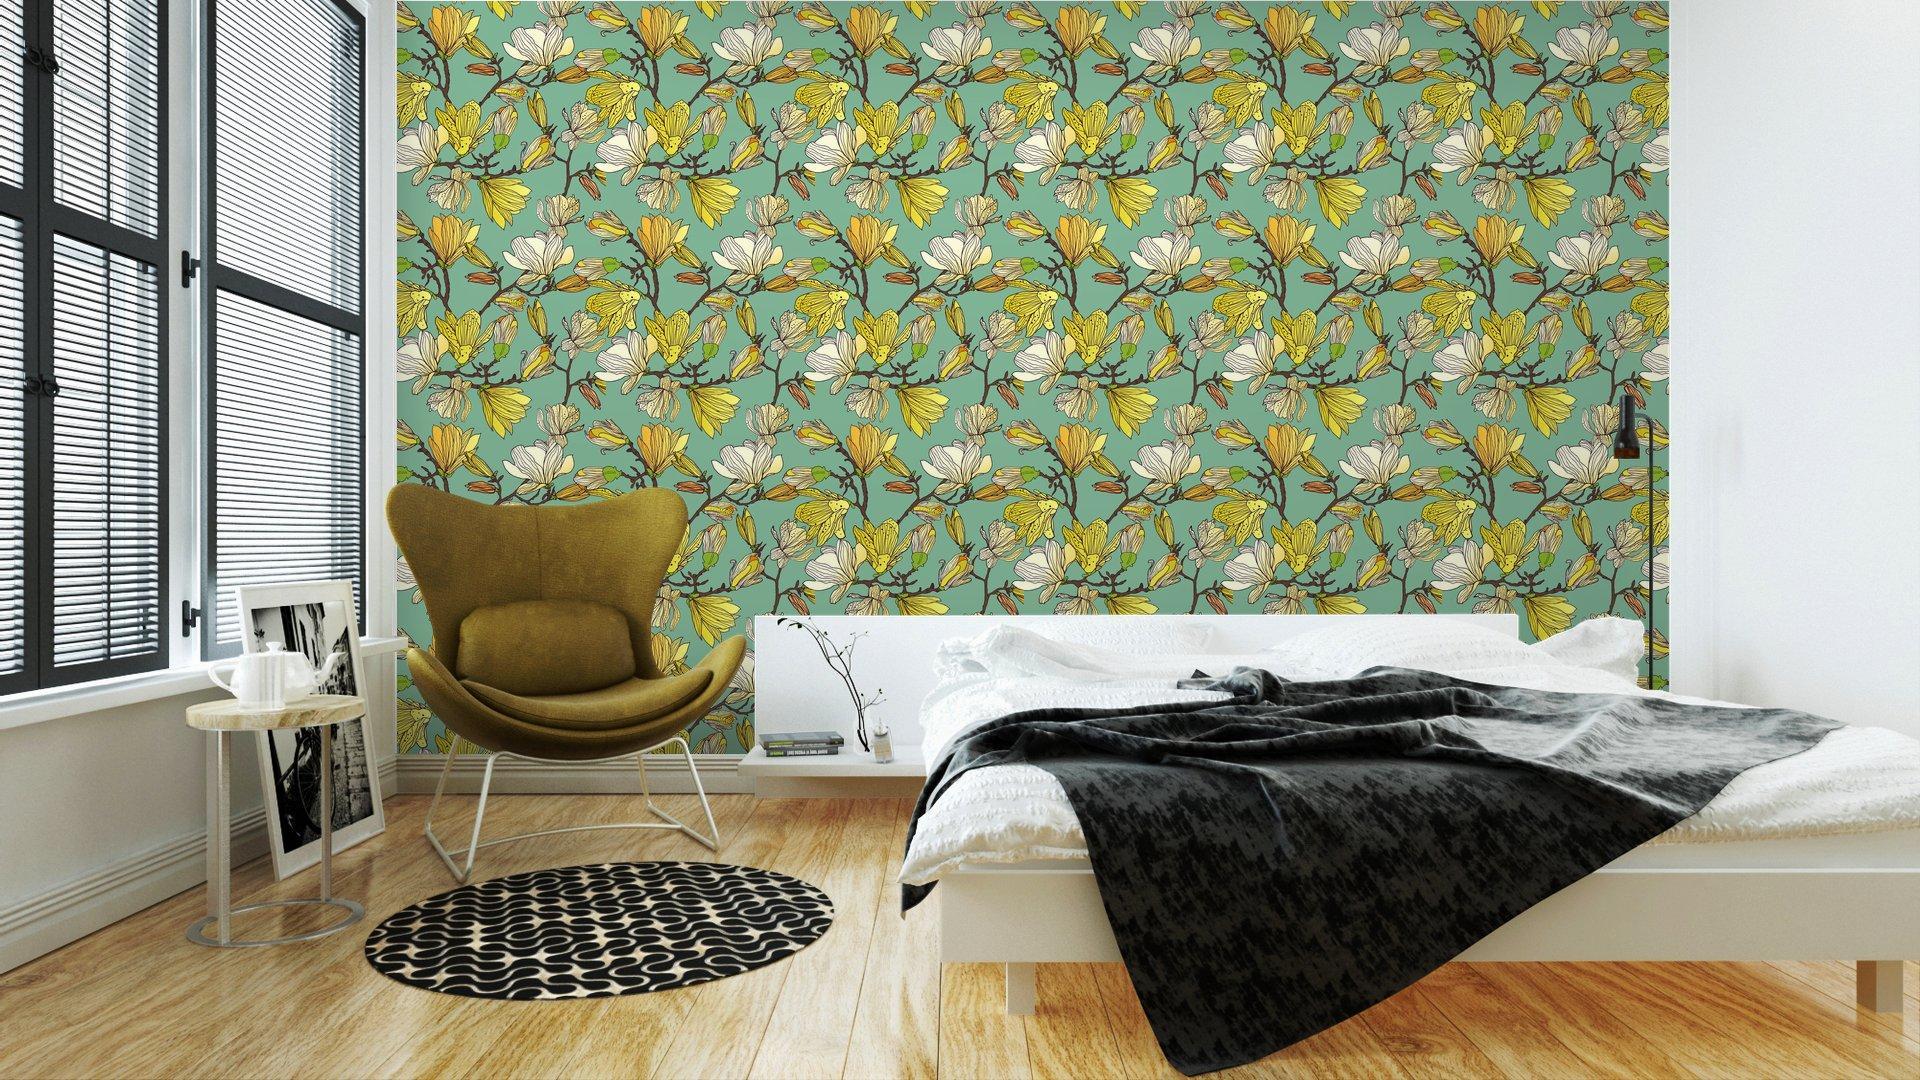 Fotomurales mexico papeles pintados textura floral sin fisuras 3 - Papel Tapiz Patrón Floral en Fondo Azul Tipo Vintage 01